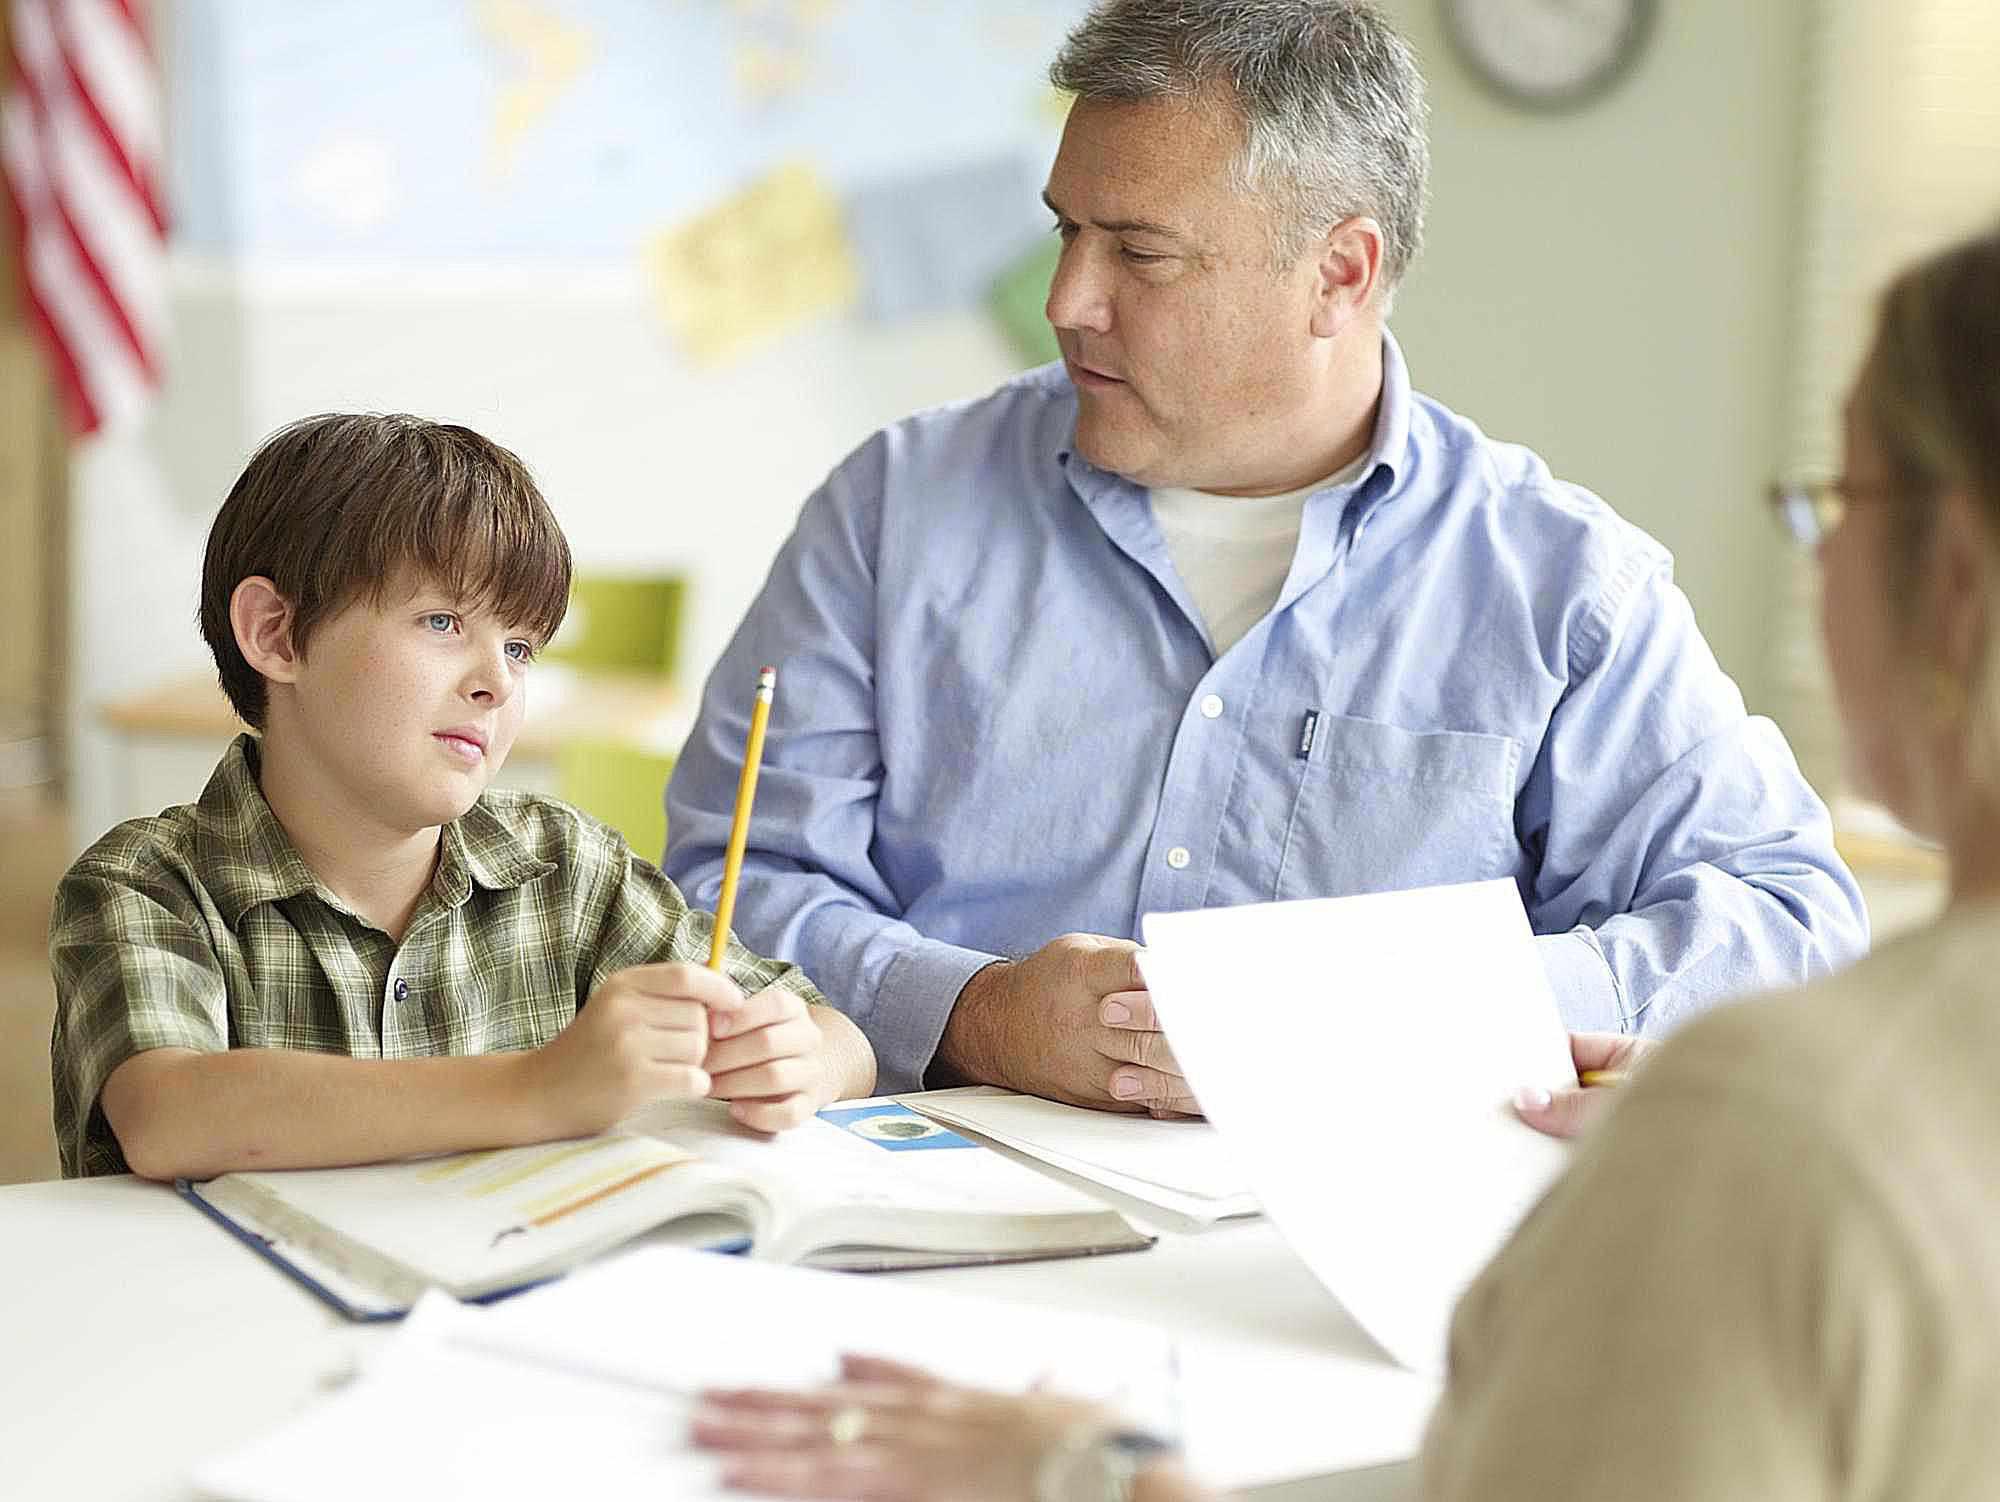 ways of improving discipline in schools essay spm